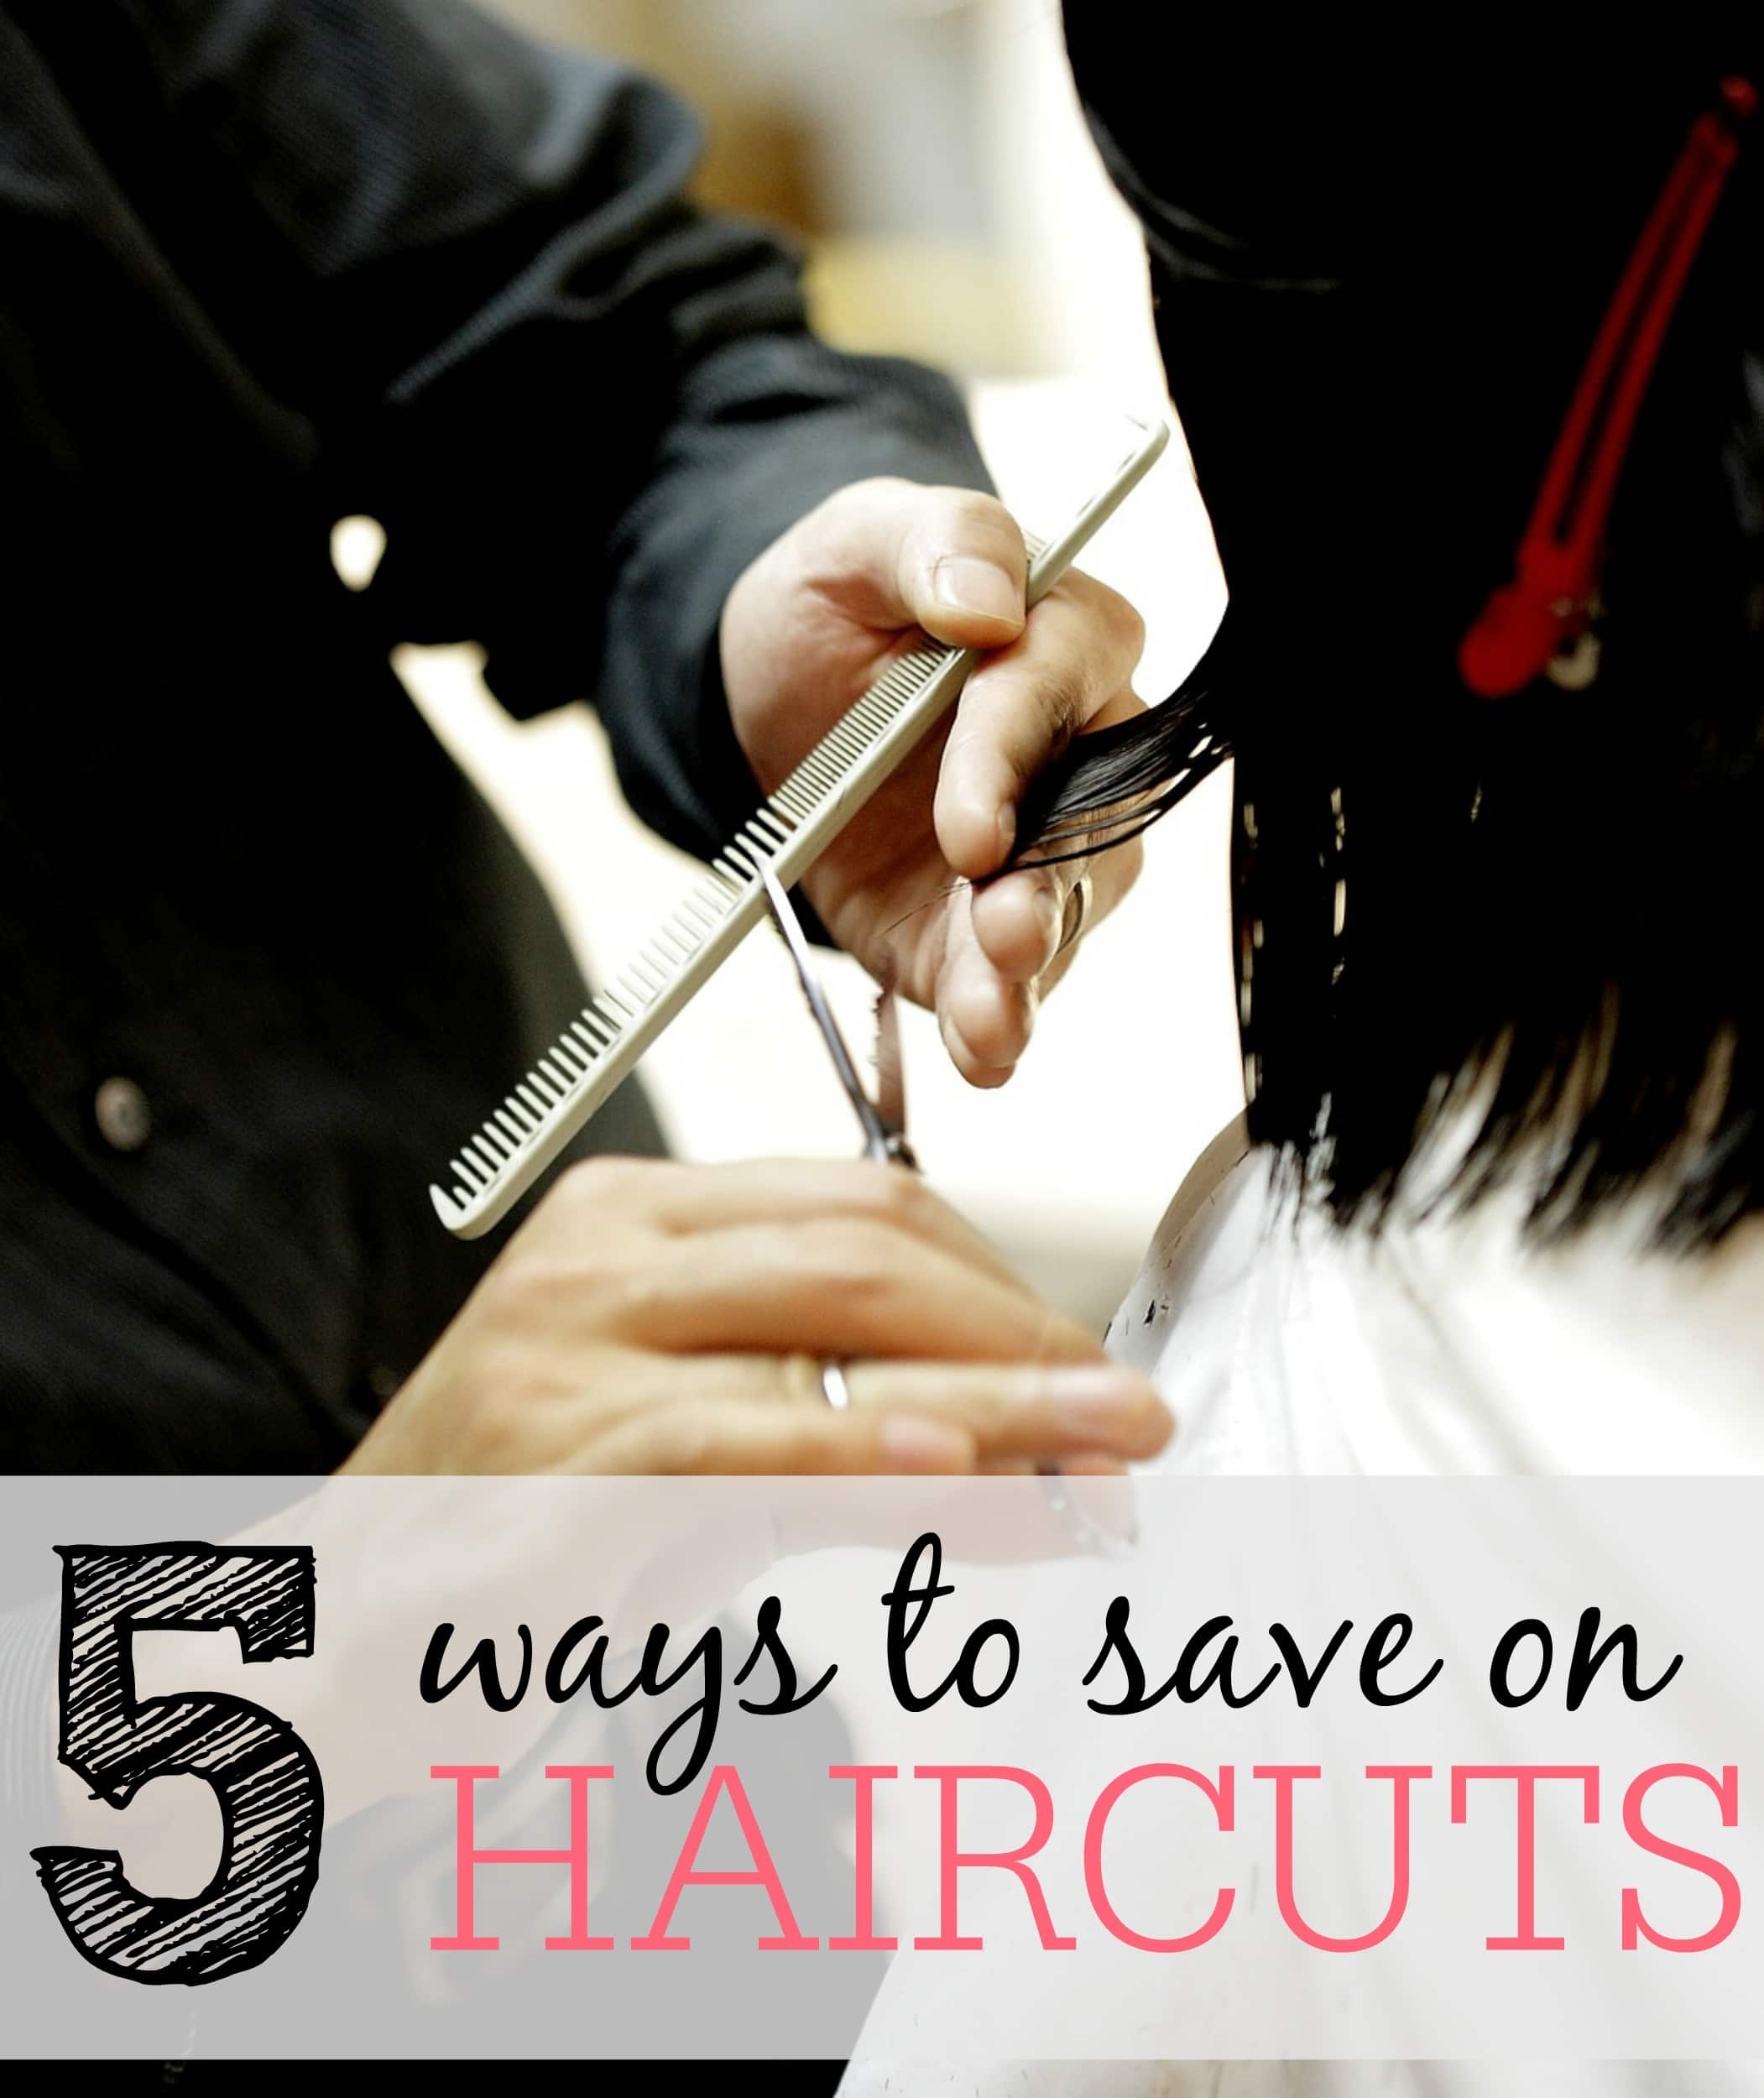 save on haircuts